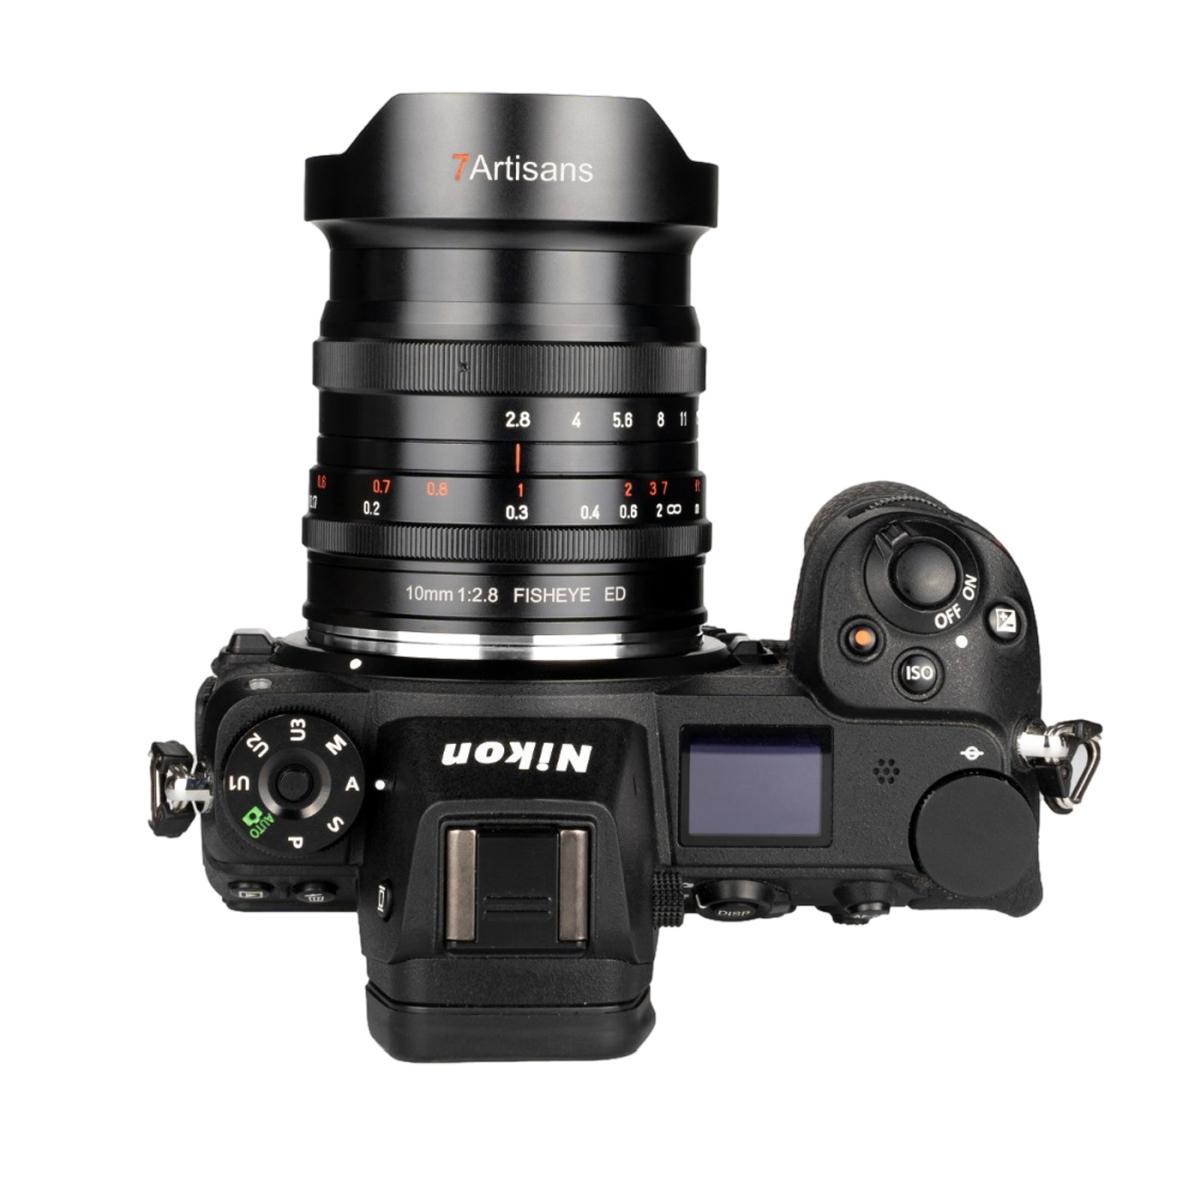 7Artisans 10 mm 1:2,8 Fisheye ED für Nikon Z